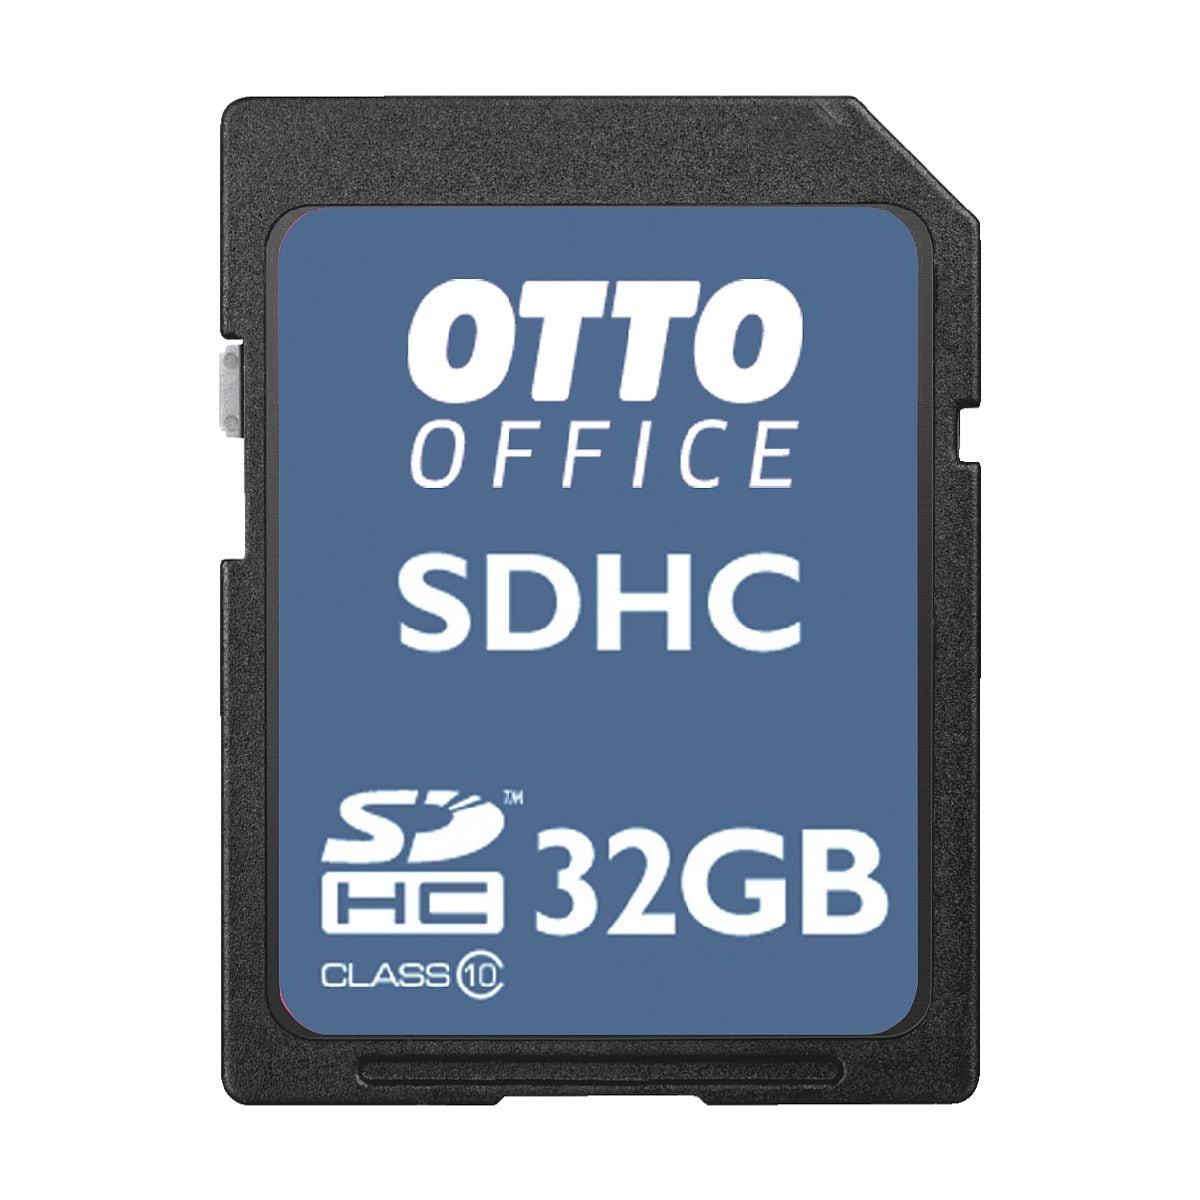 OTTO Office SDHC-Speicherkarte »32GB«